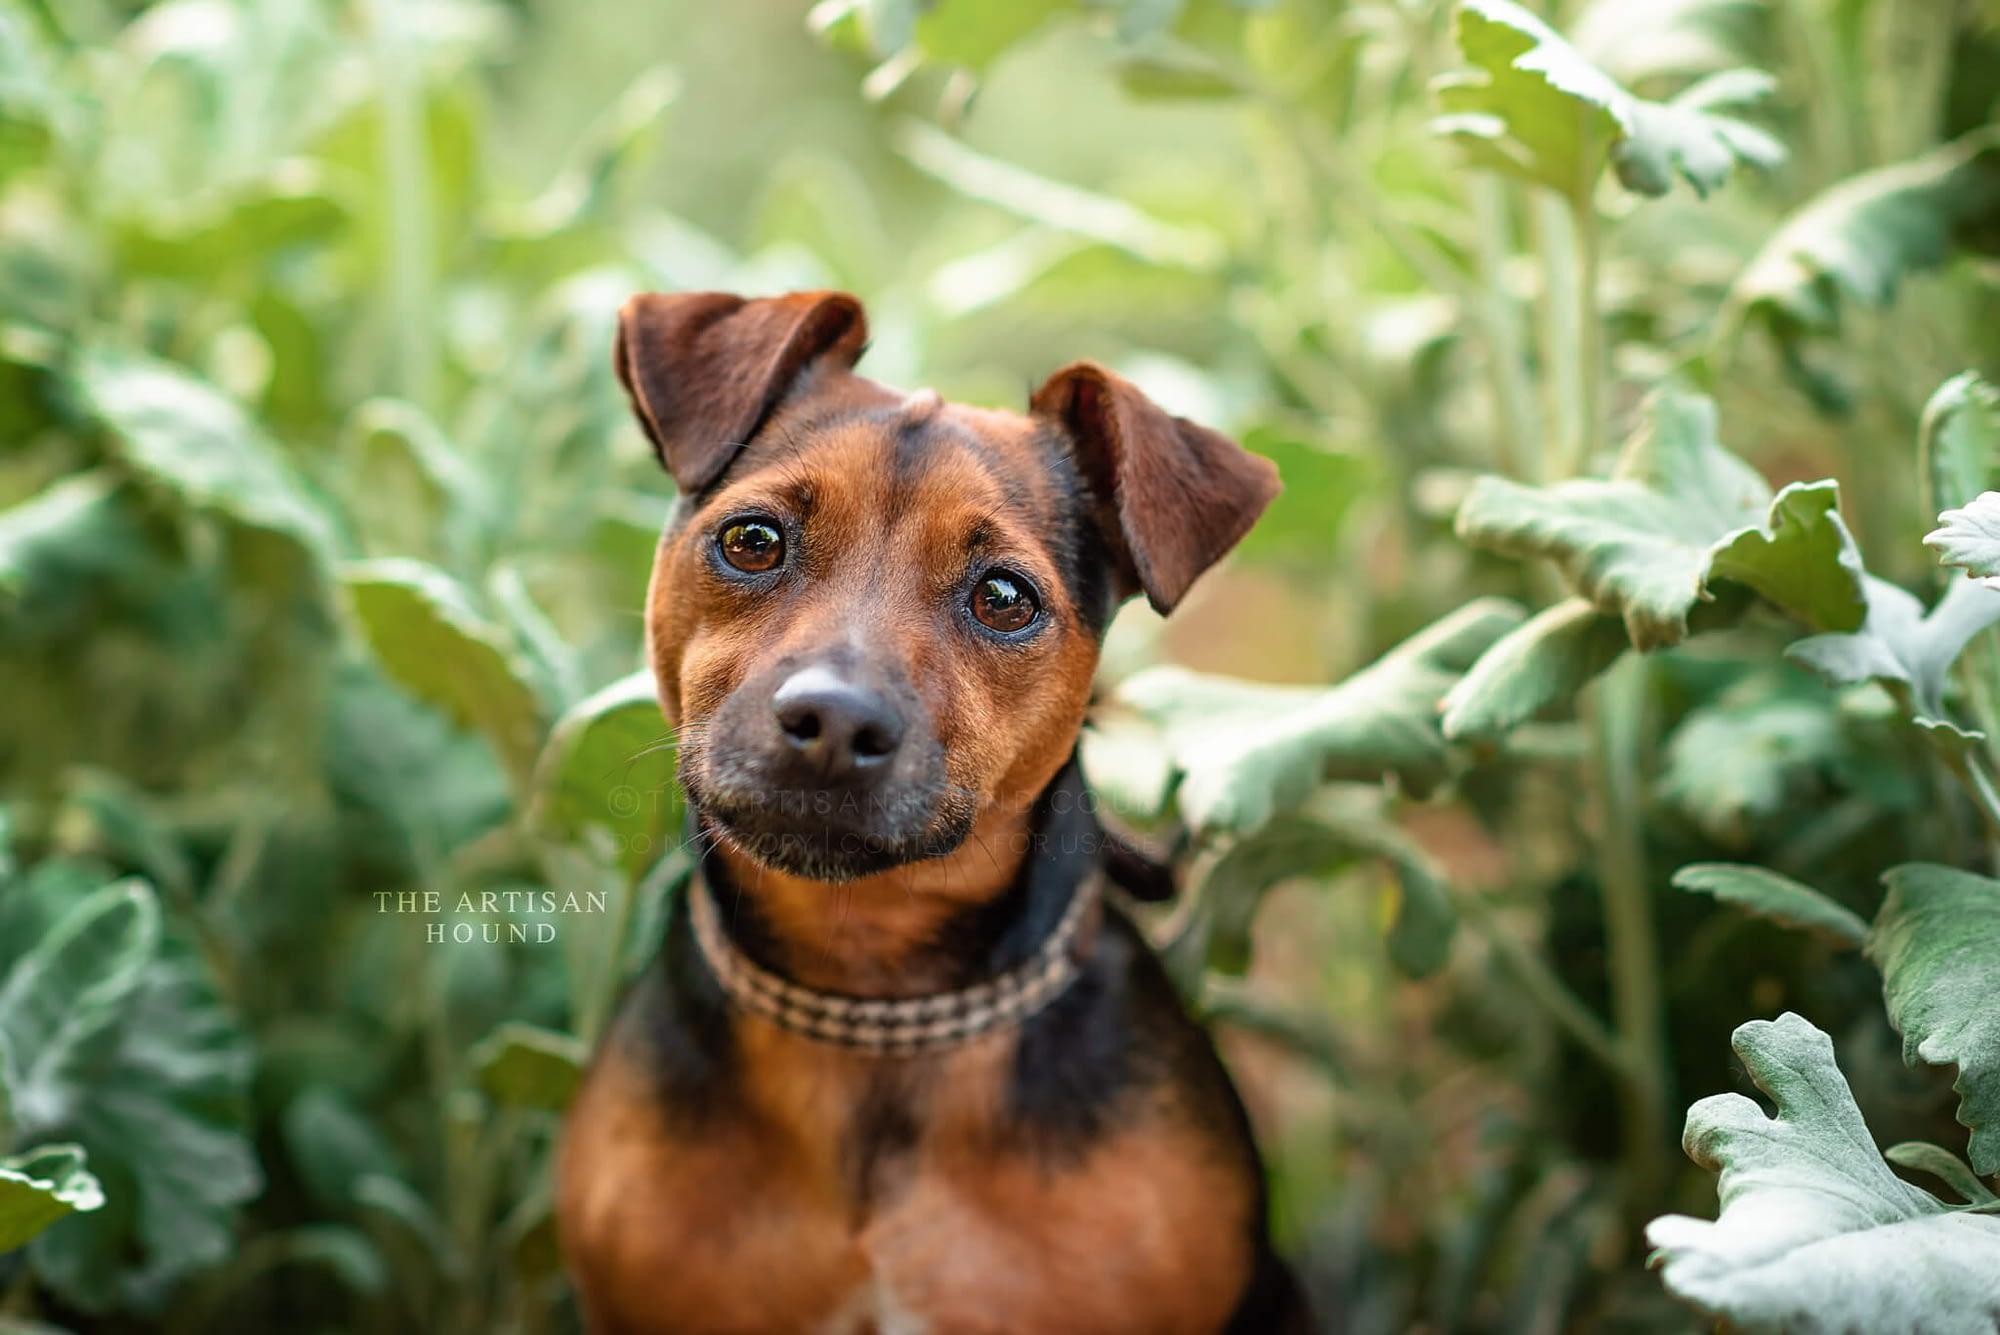 Little terrier dog sitting in flowerbed